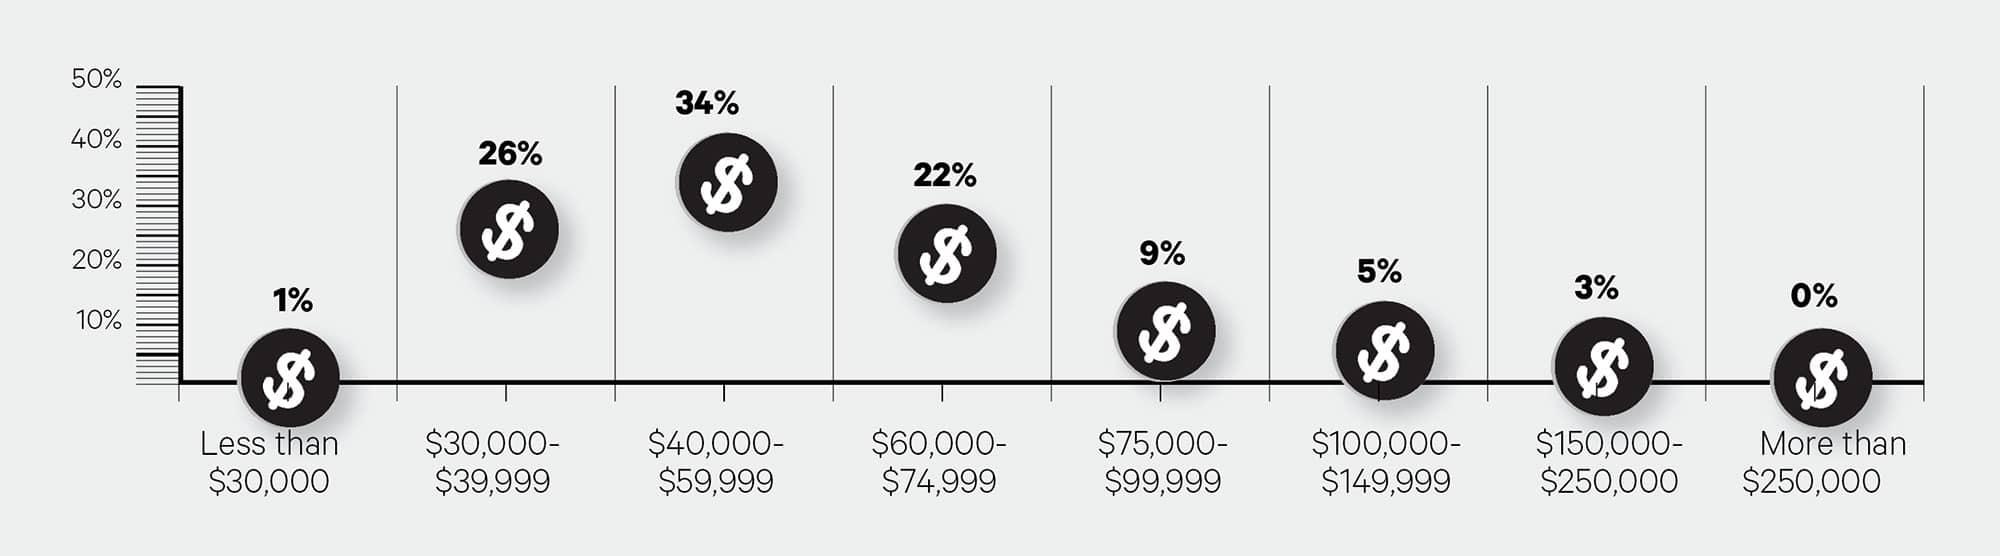 big survey 2020-manager earnings